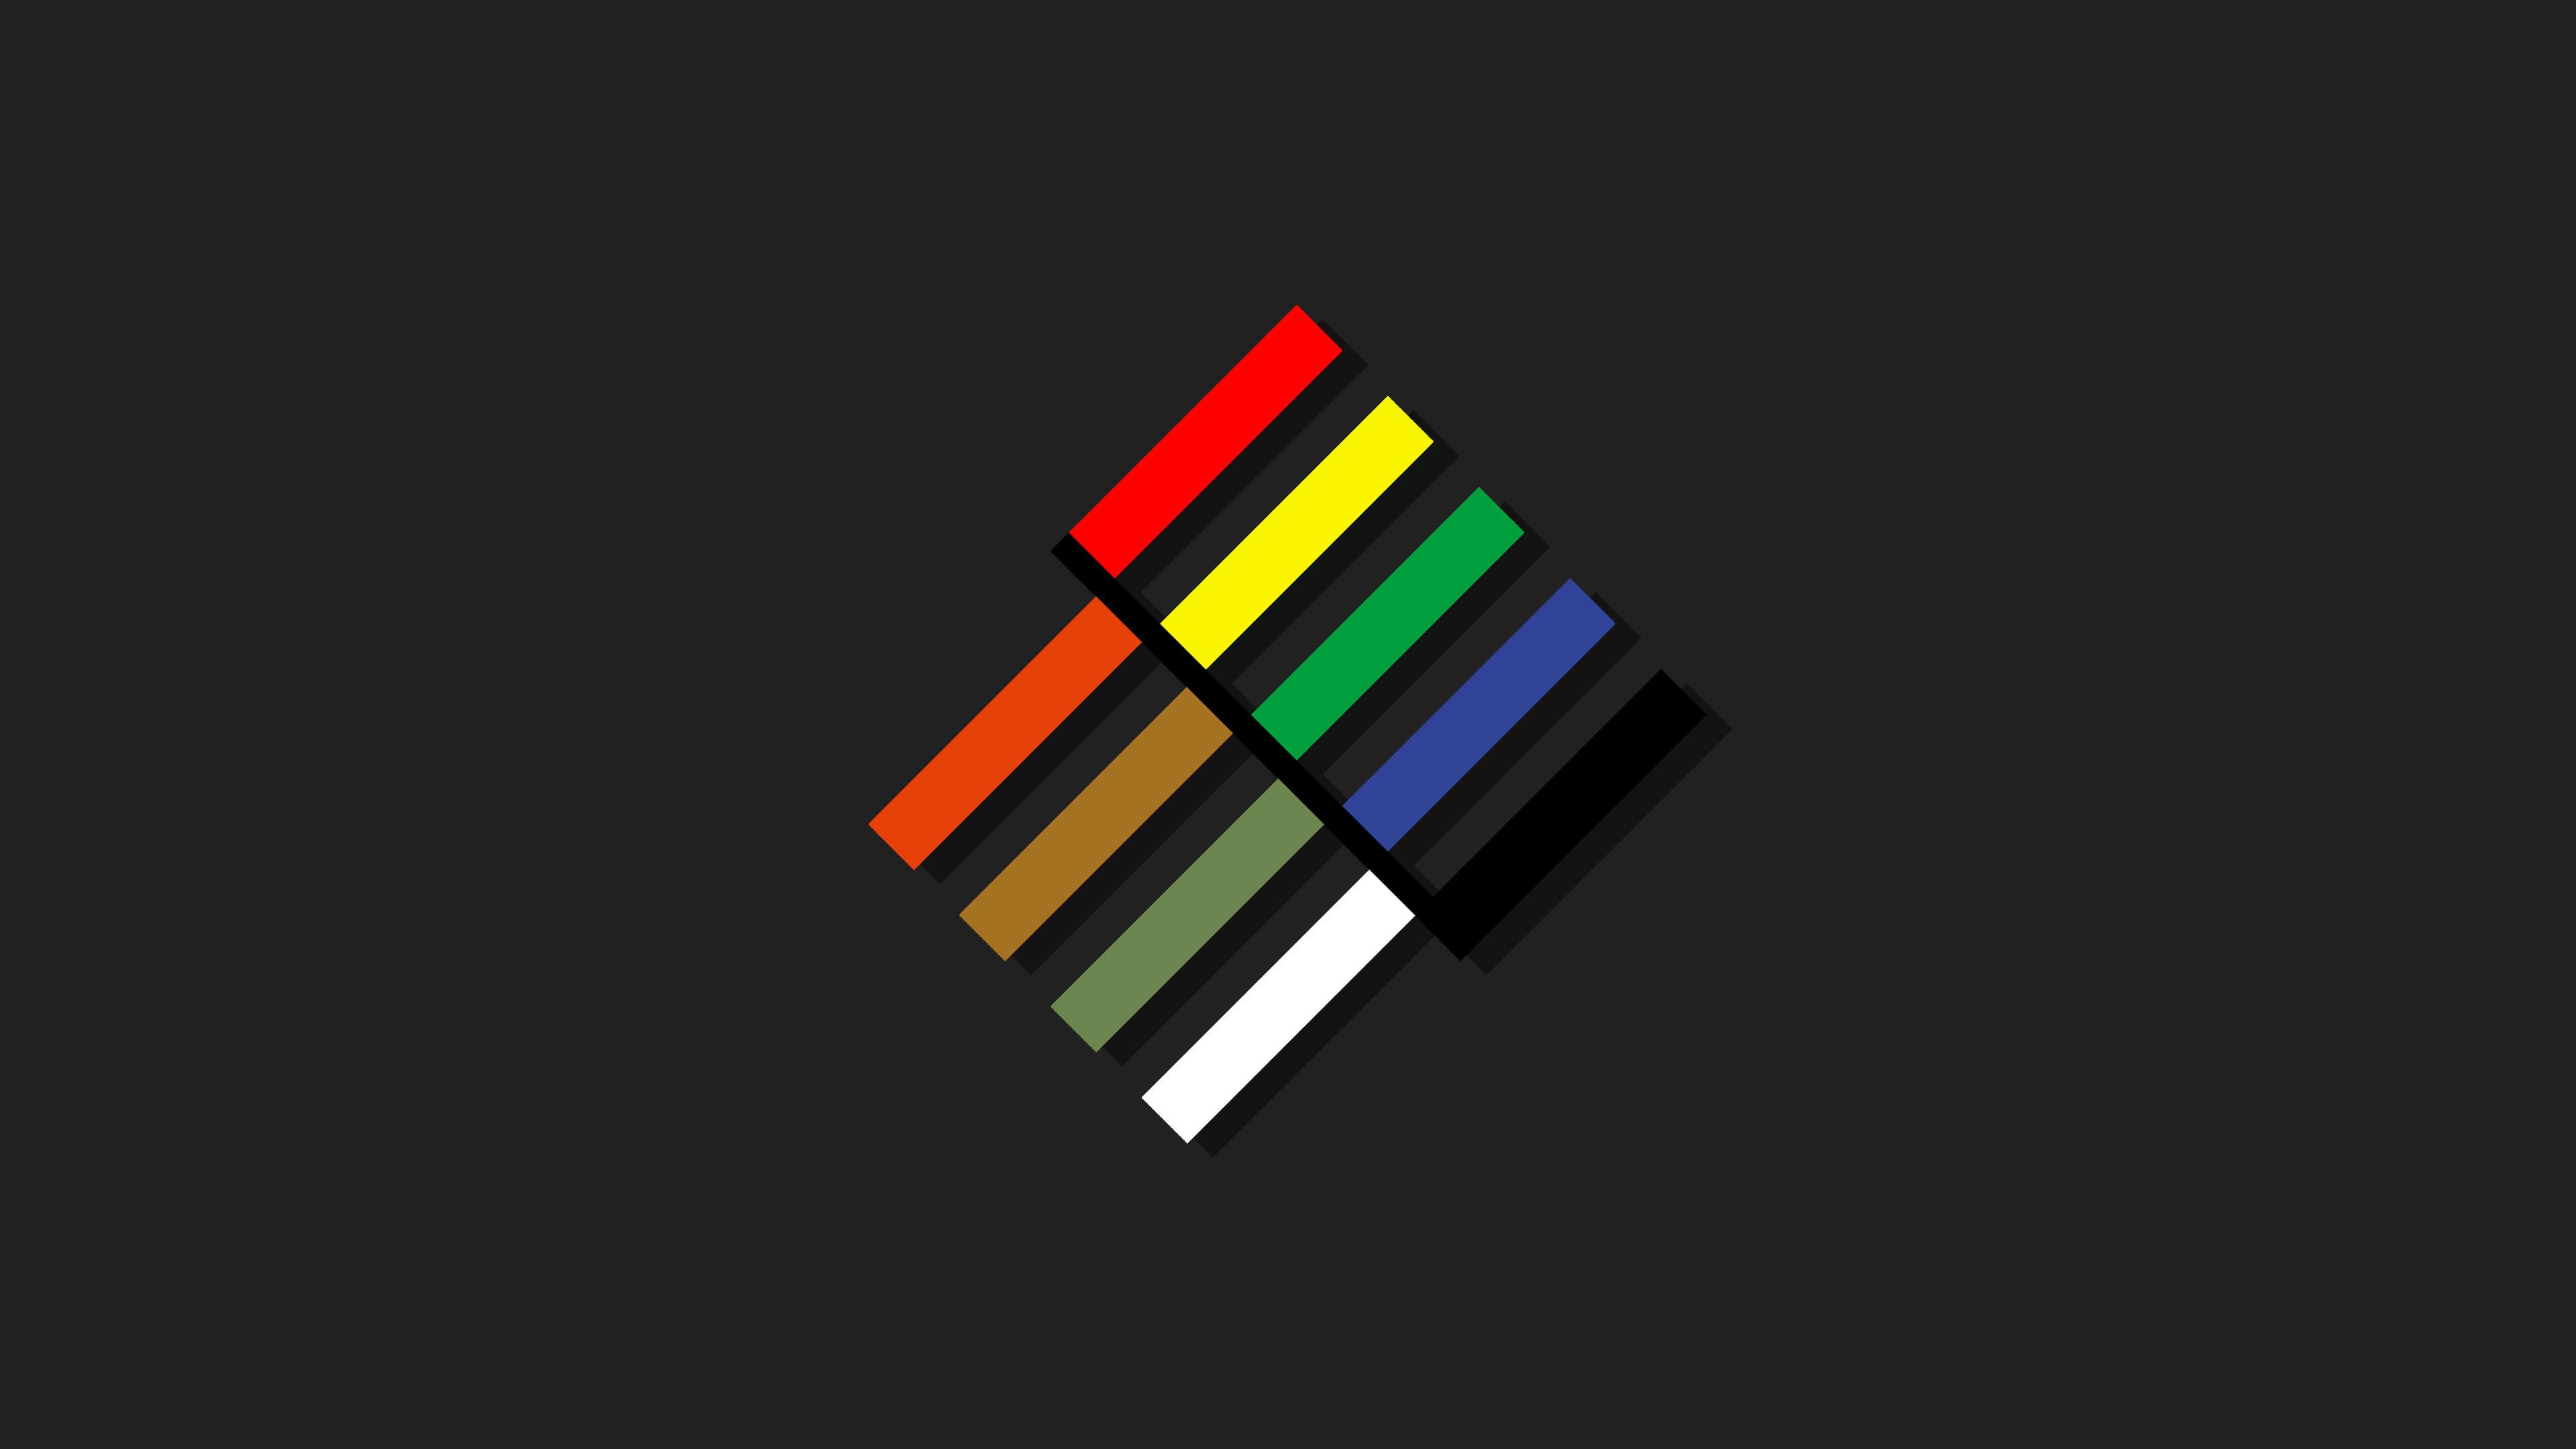 abstract colors shapes 1539370948 - Abstract Colors Shapes - shapes wallpapers, hd-wallpapers, colors wallpapers, abstract wallpapers, 4k-wallpapers